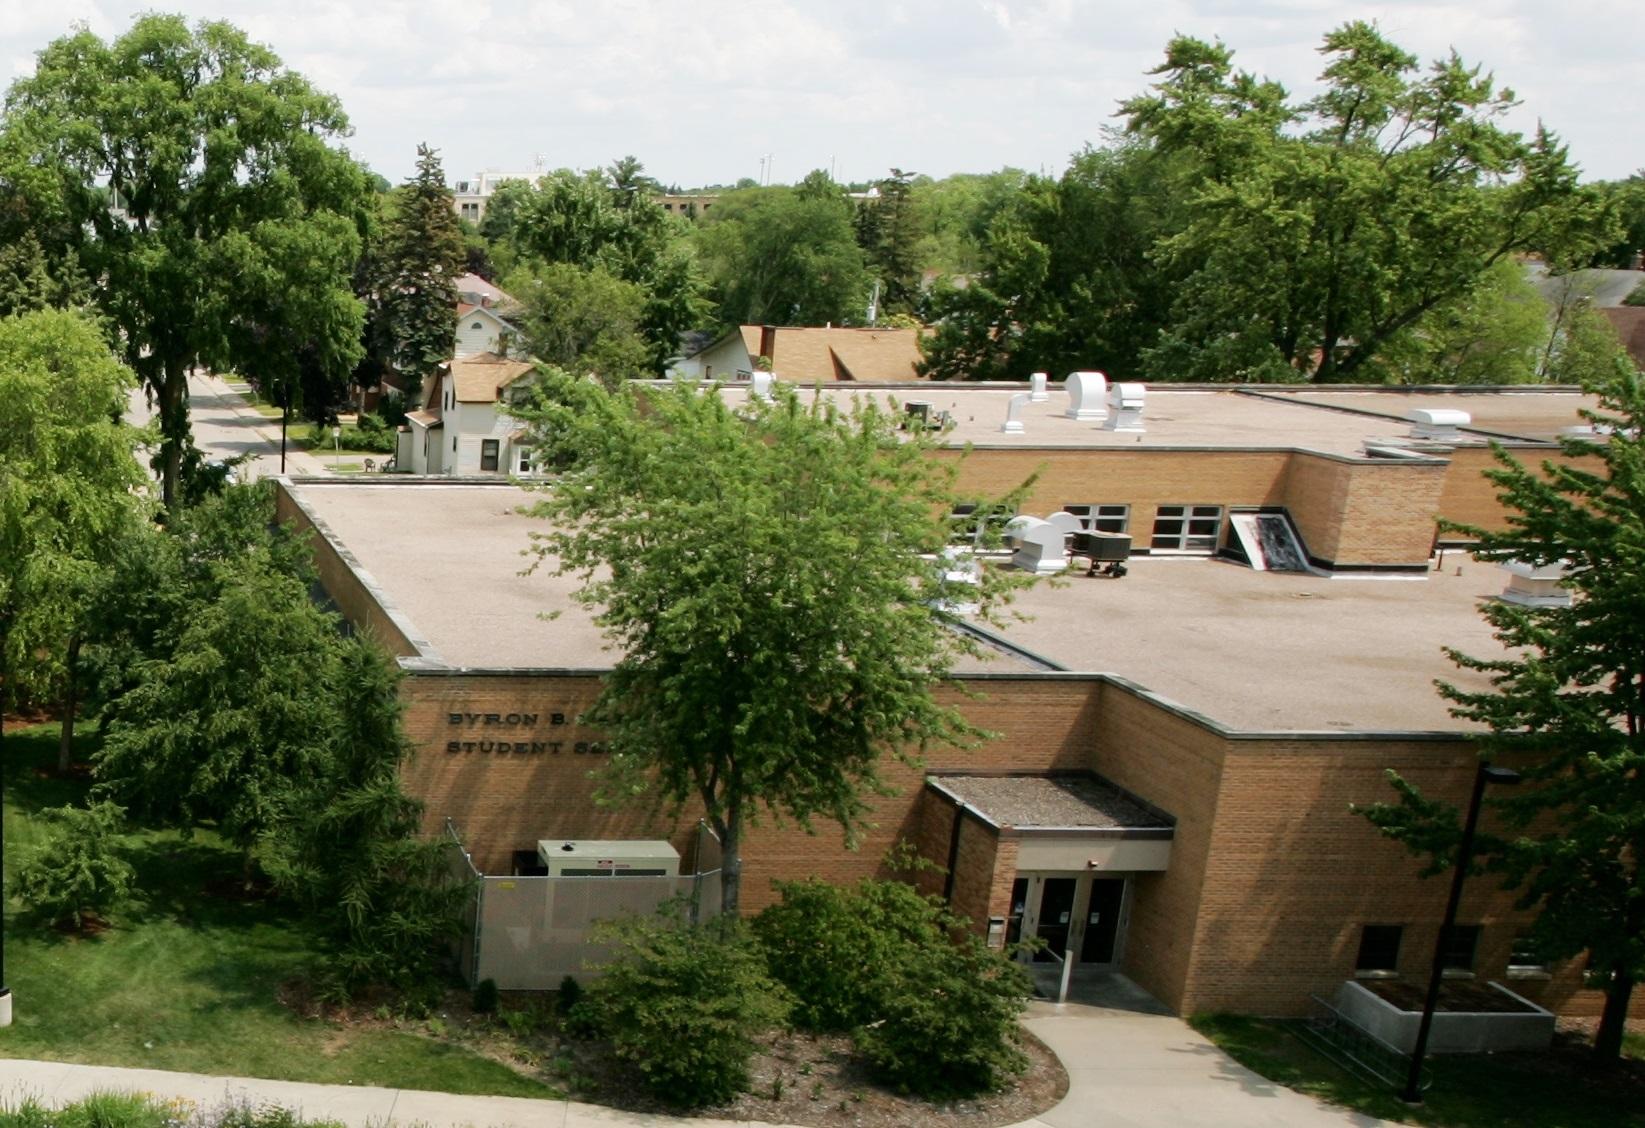 Student Services Center at UW-Stevens Point